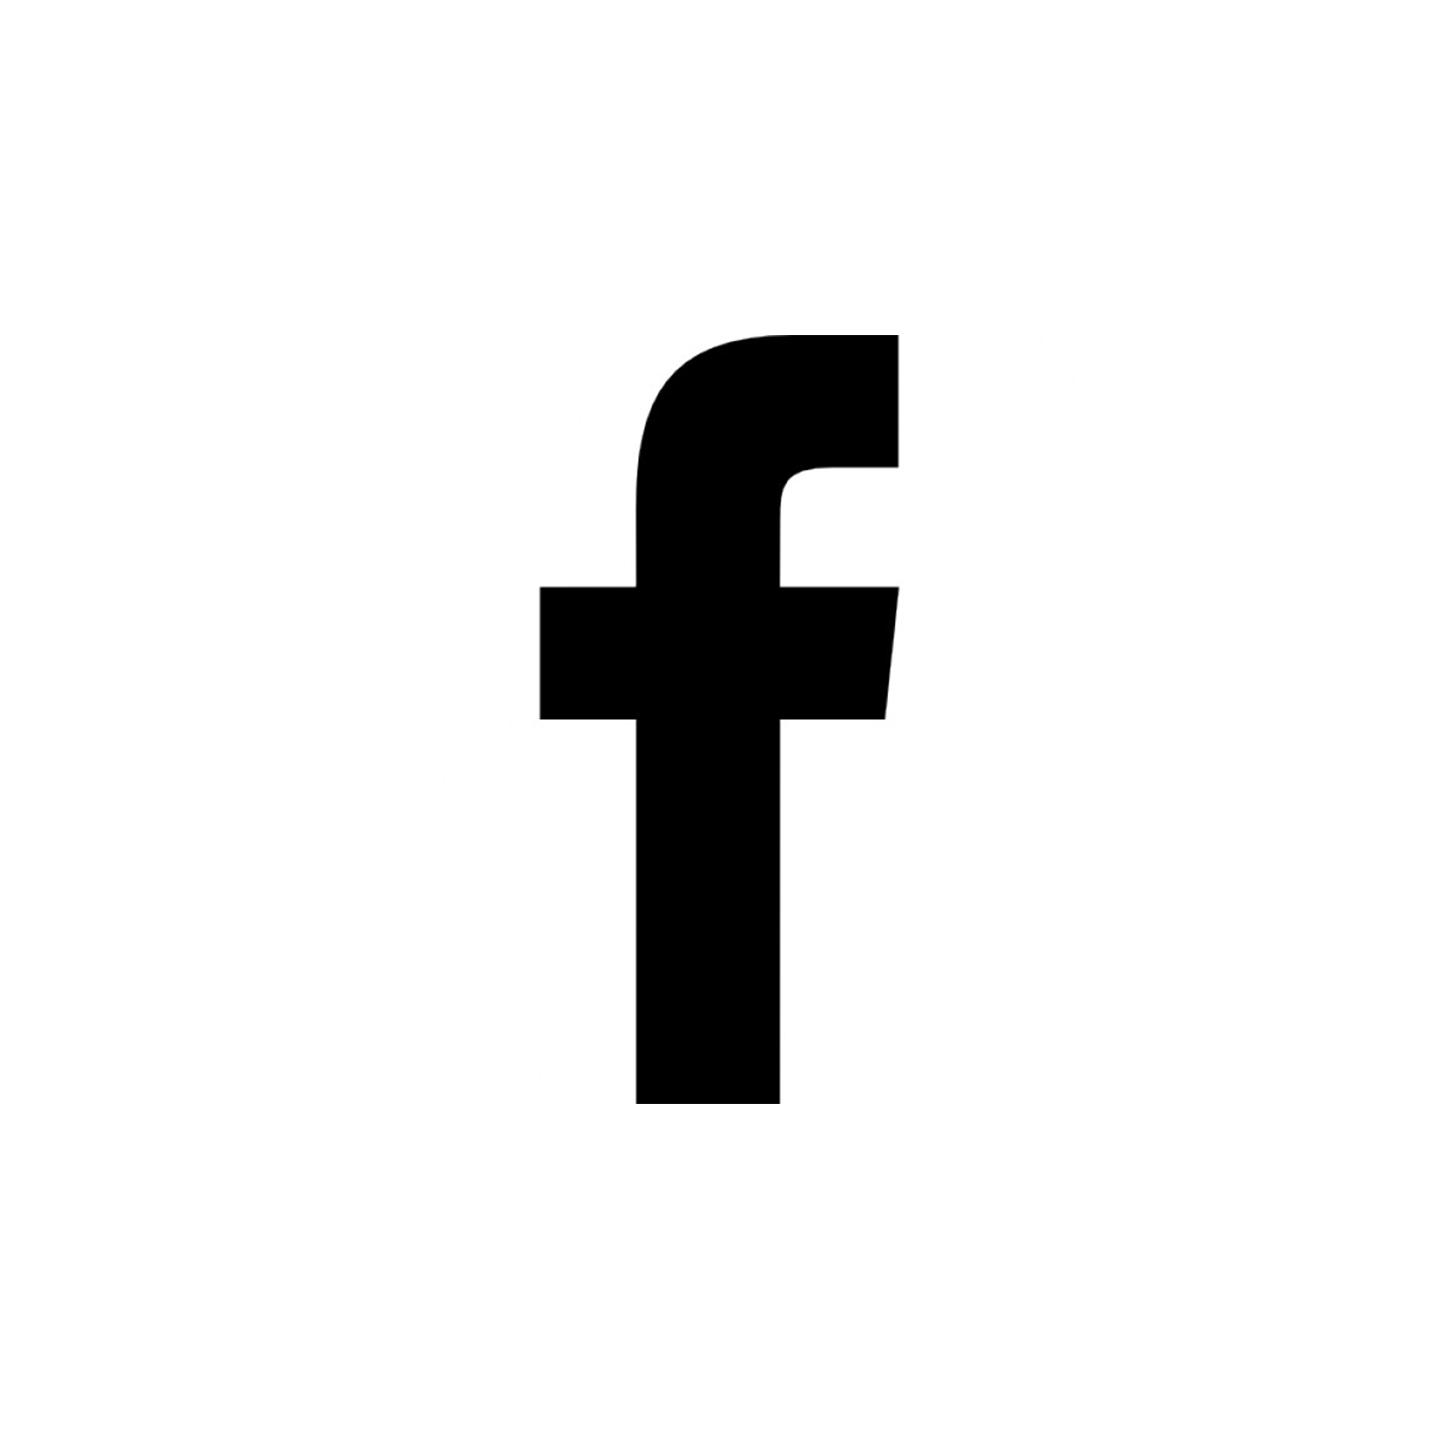 scout rental co. facebook